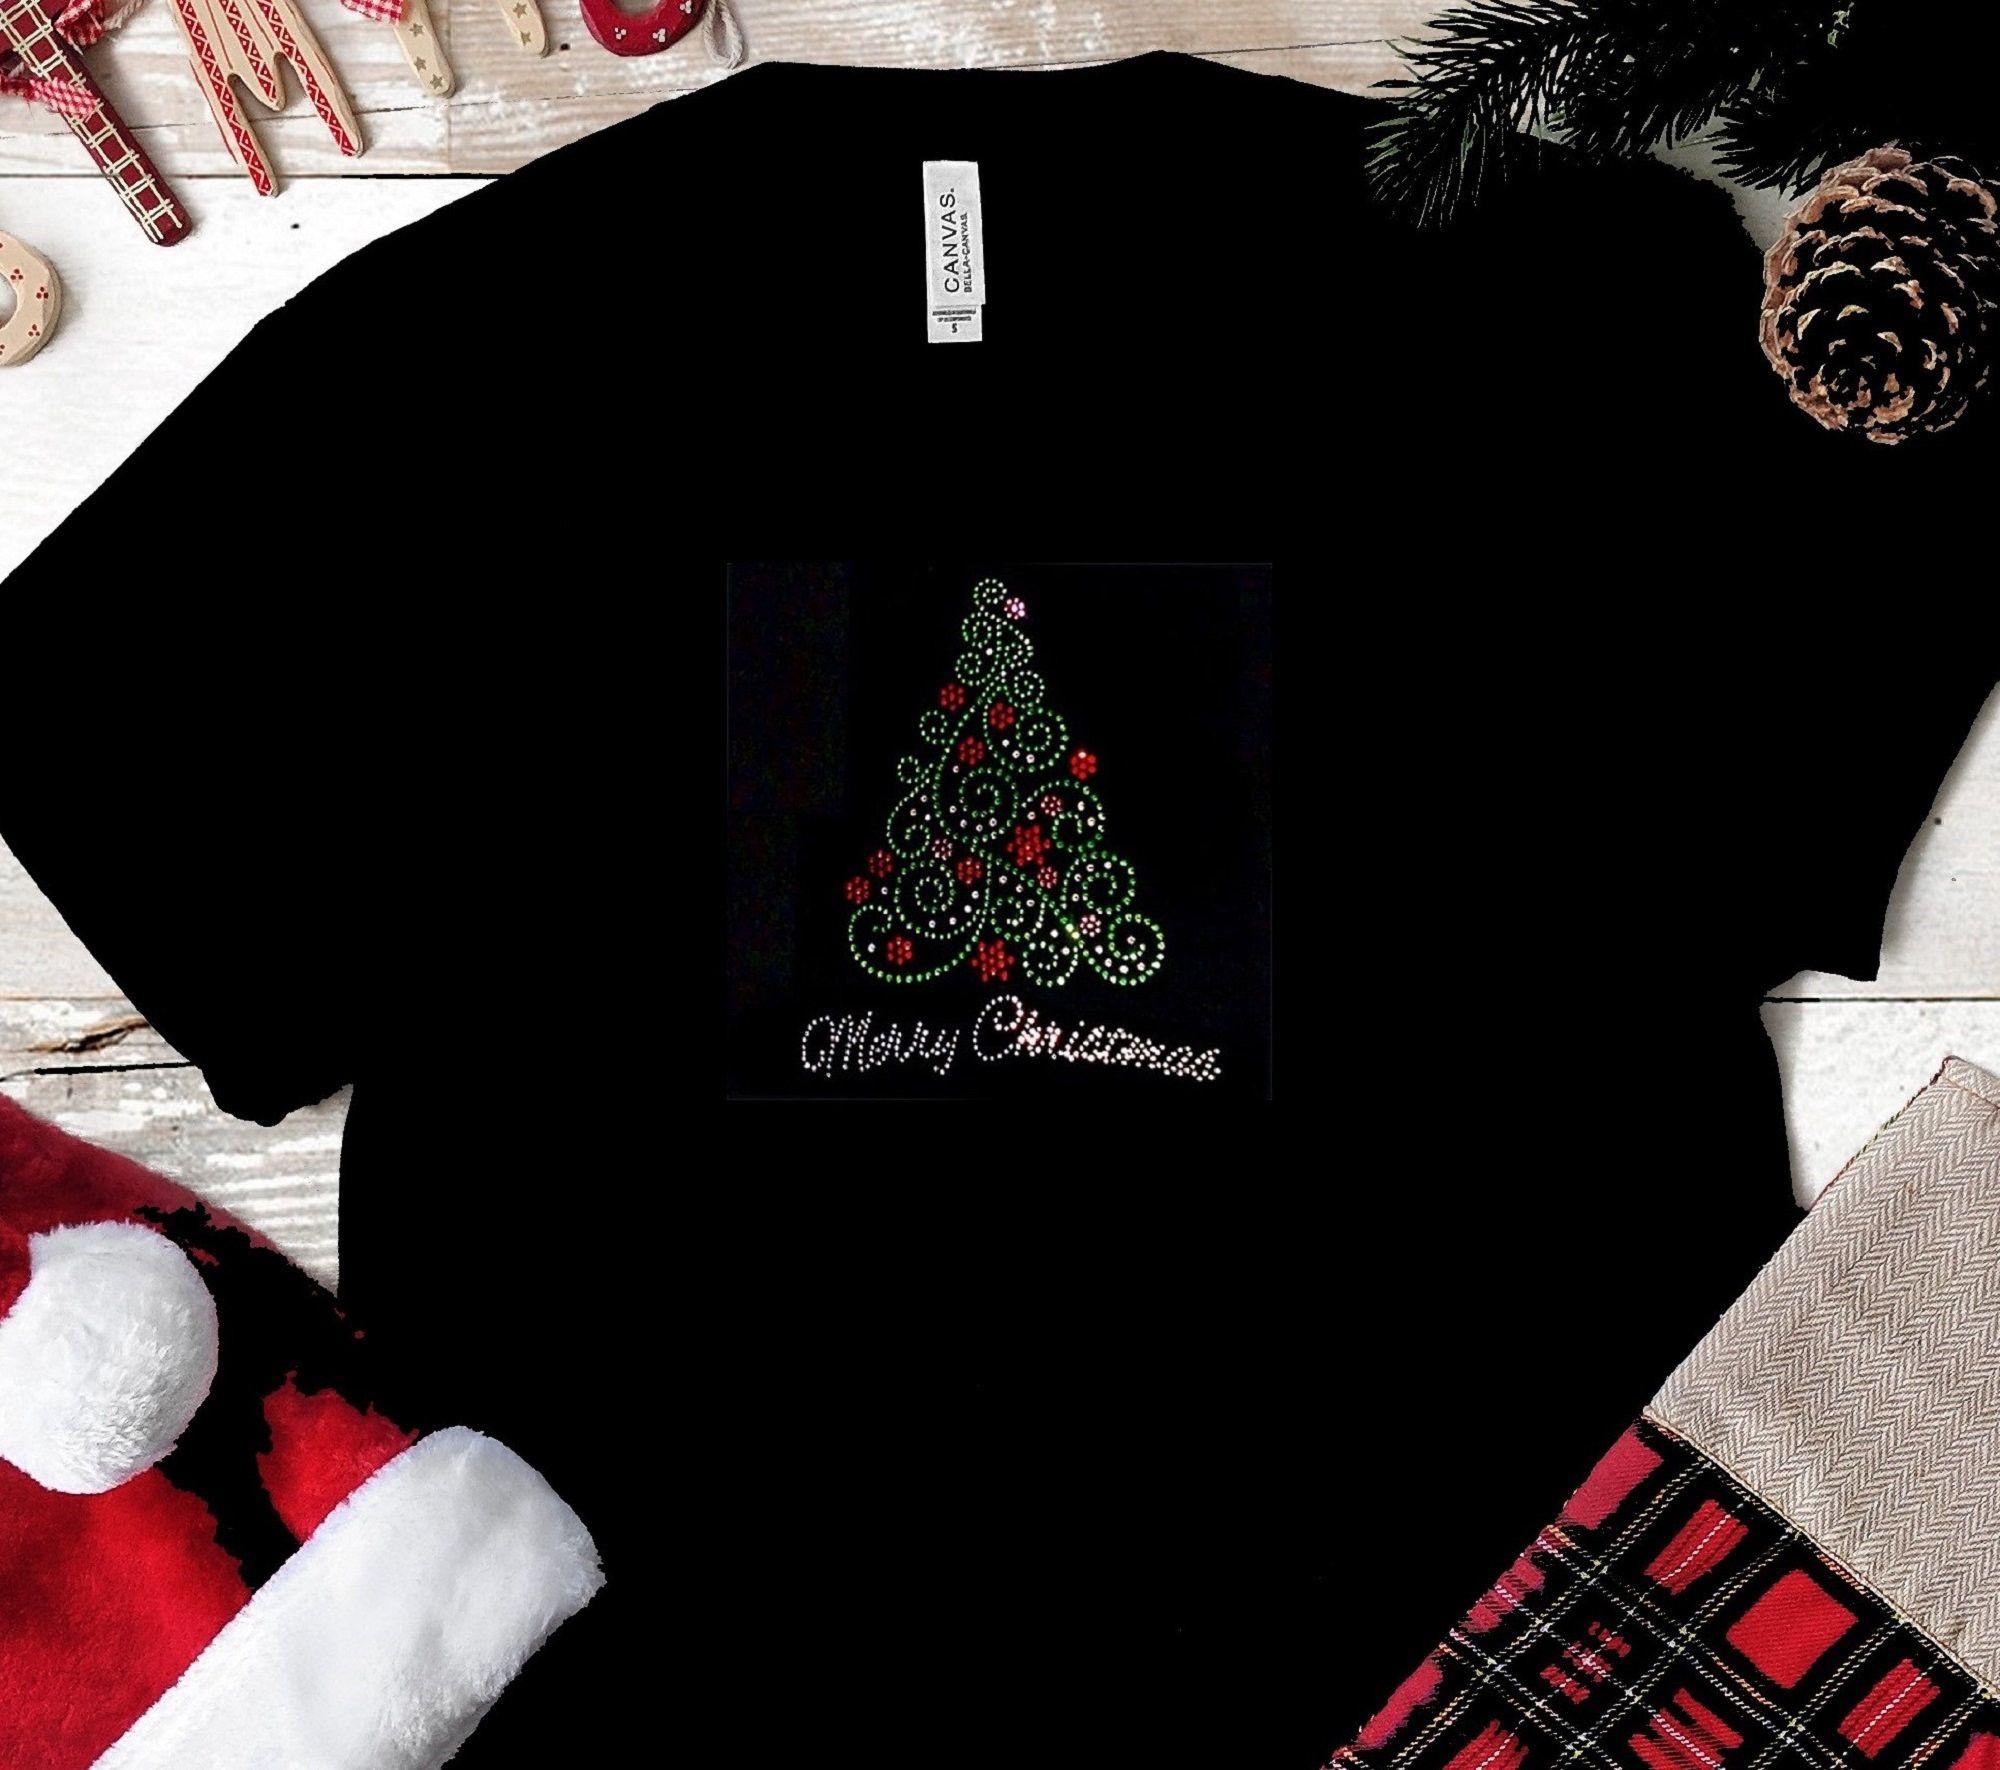 HOLIDAY TEE,CHRISTMAS TEE,PLUS SIZE CLOTHING,PLUS SIZE CHRISTMAS SHIRT,PLUS TEE